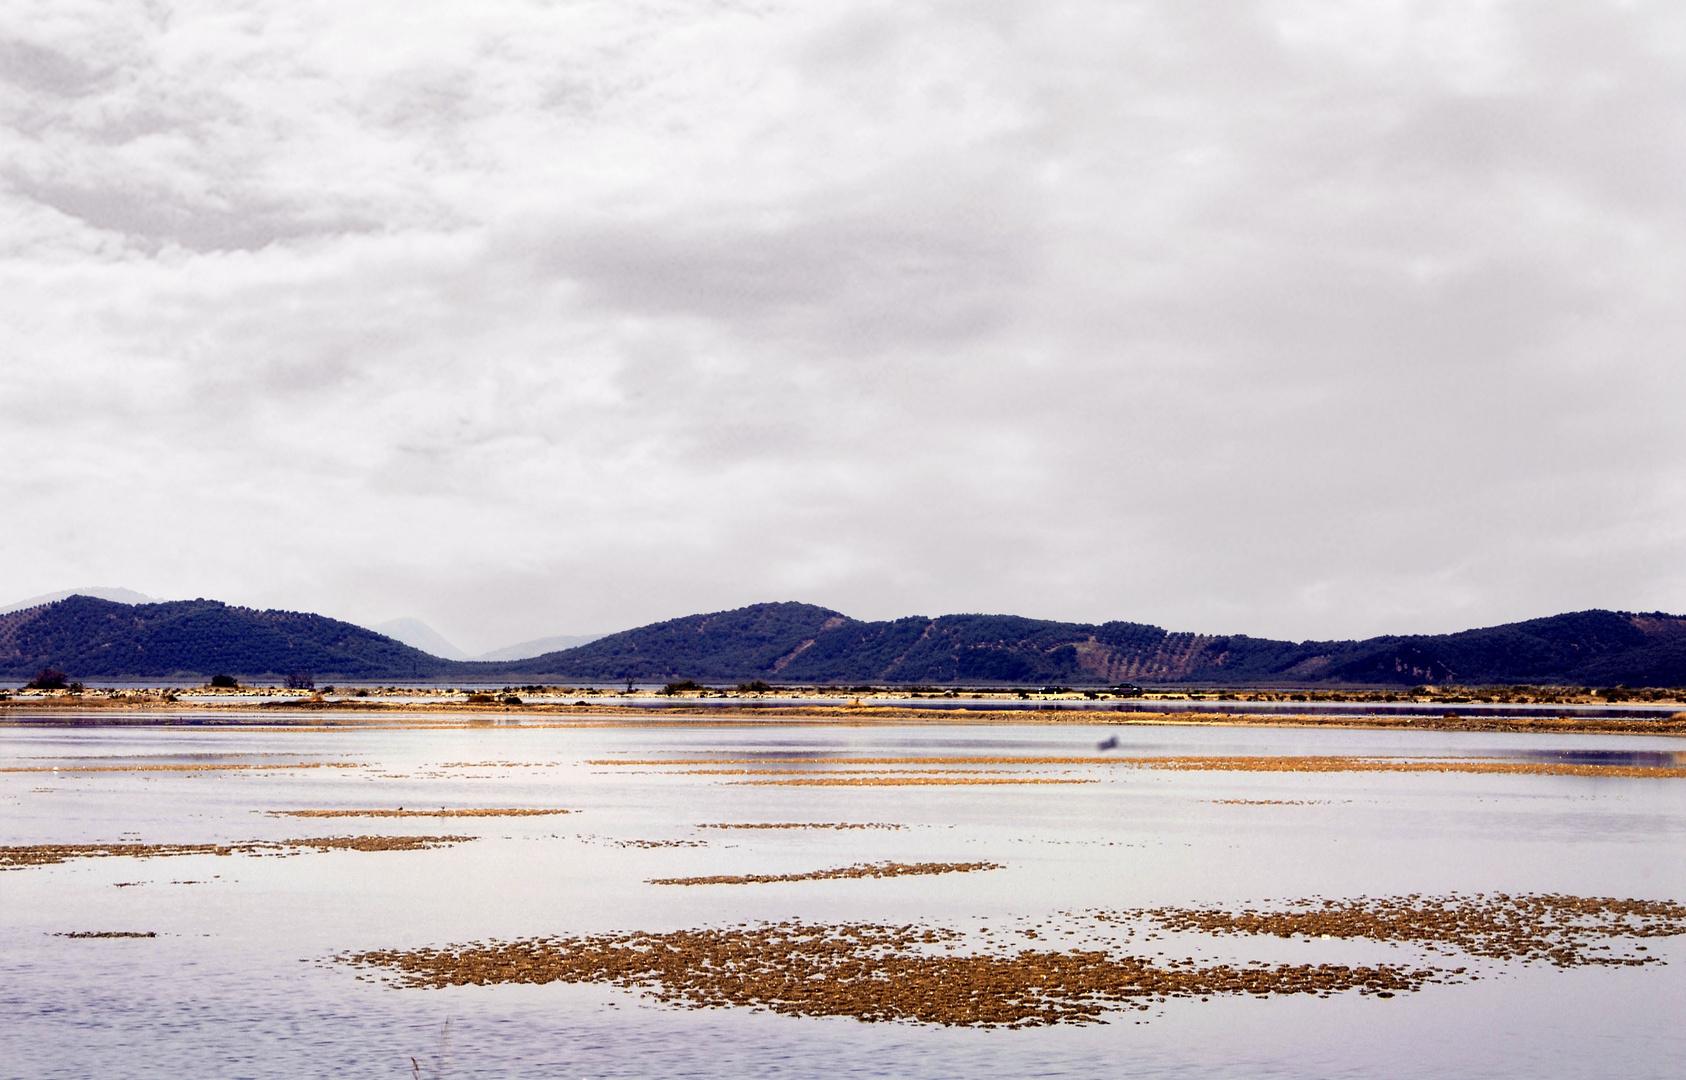 The salt lagoon